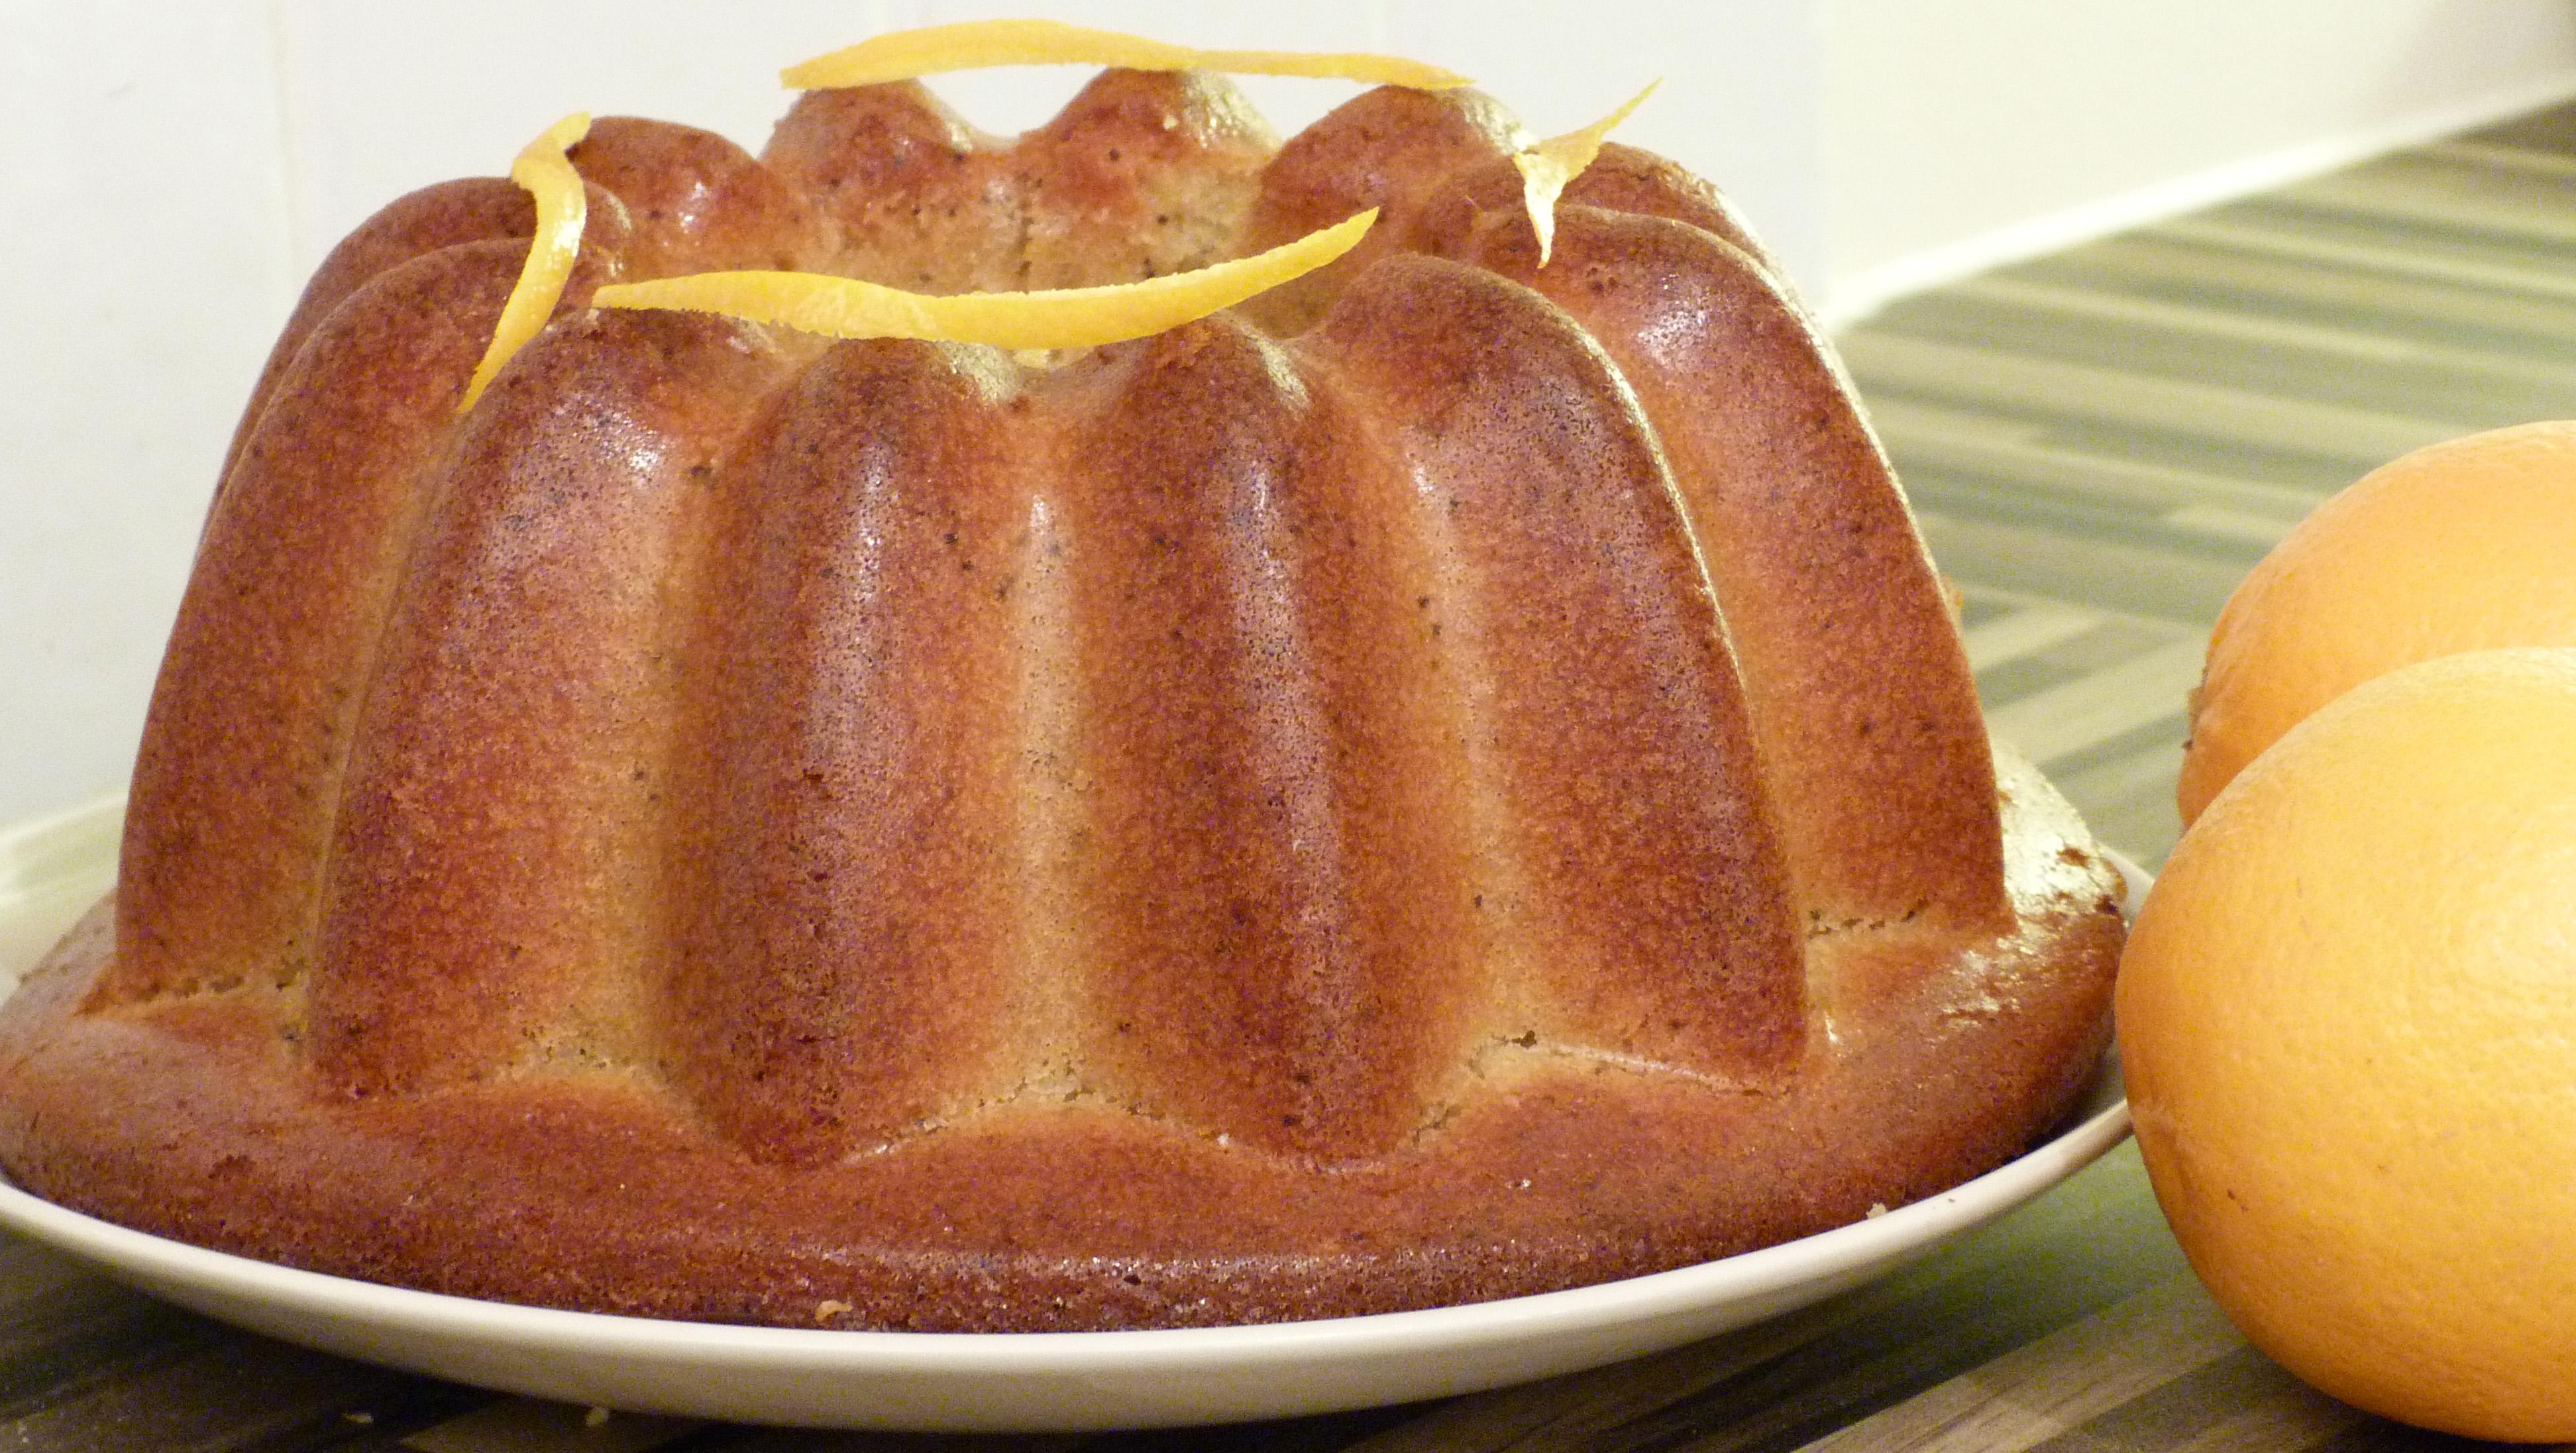 Blog Cake Design Recette : recette gateau Prettylittletruth - Blog de fille ...